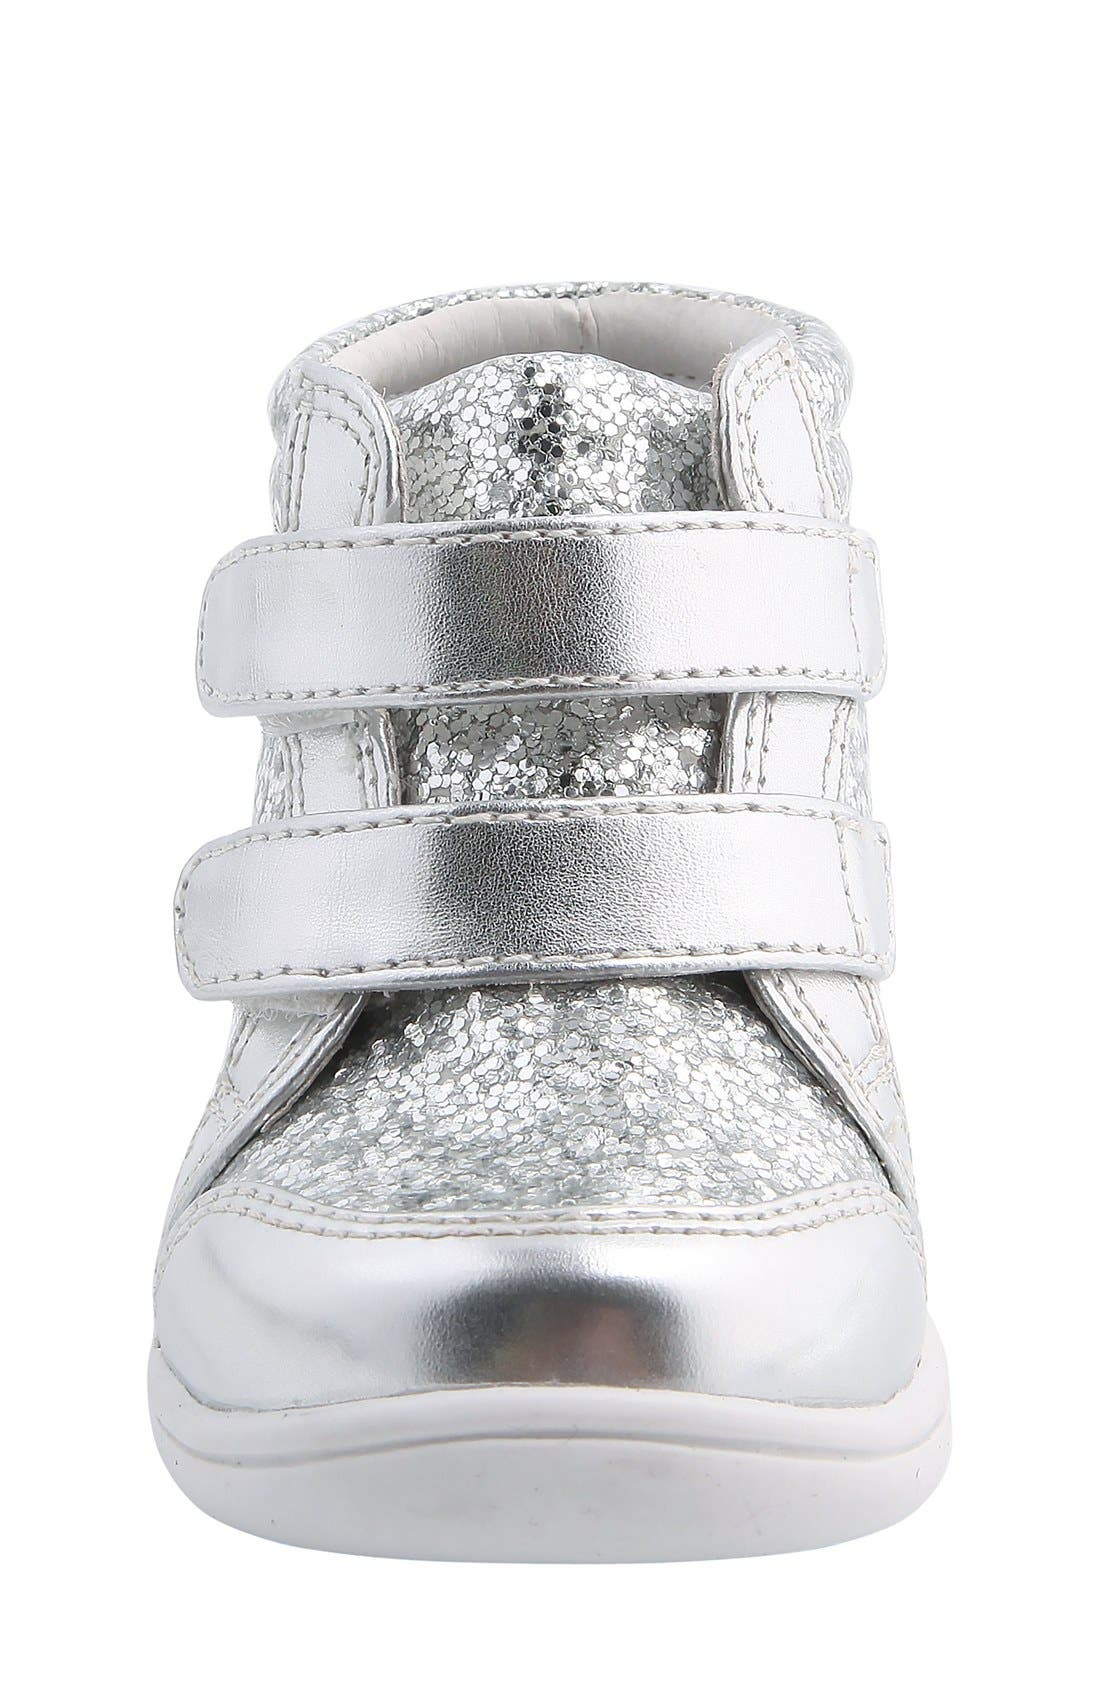 Nina 'Stardust' Metallic High Top Sneaker,                             Alternate thumbnail 5, color,                             Silver Metallic